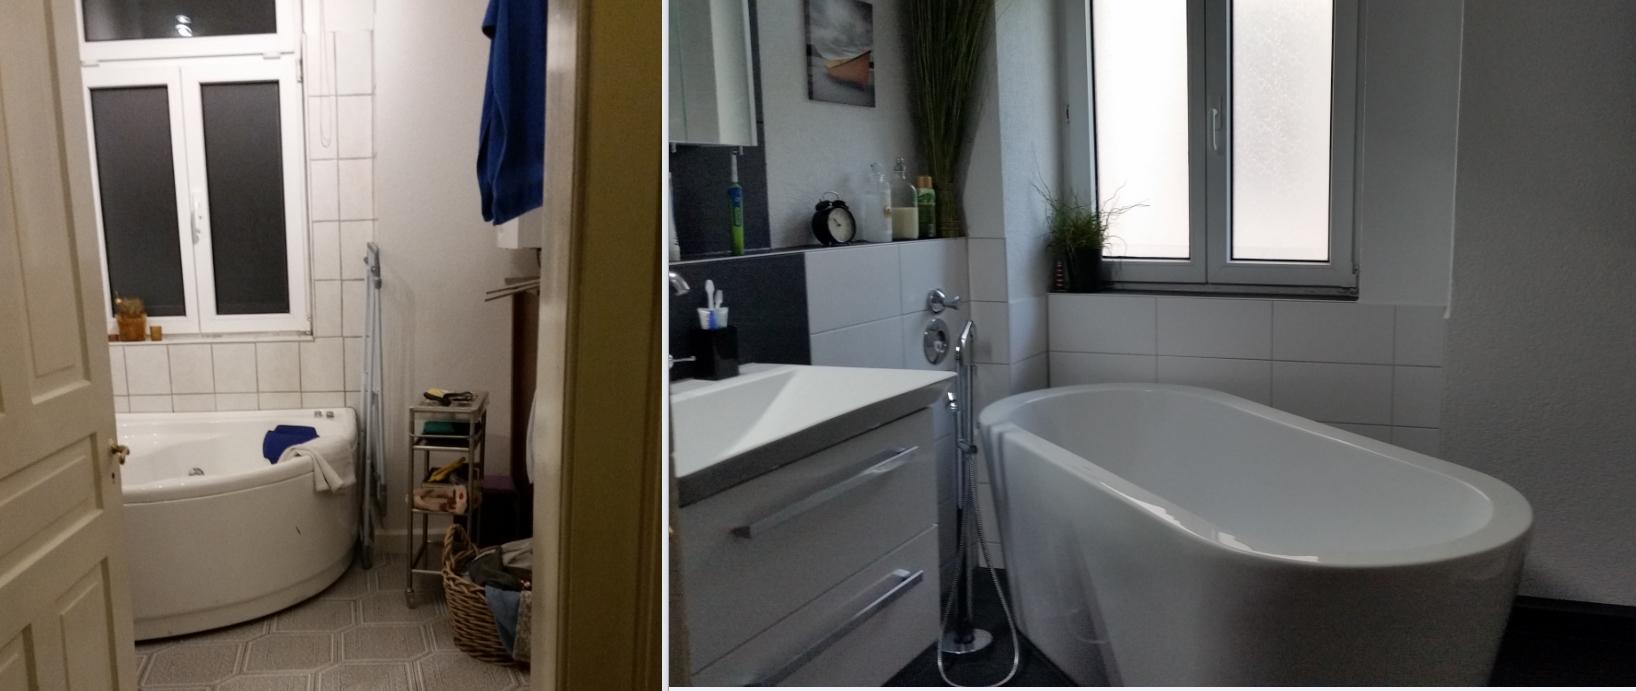 bad vorher nachher badezimmer renovieren vorher nachher awesome perfekt marco ludwig er bad. Black Bedroom Furniture Sets. Home Design Ideas